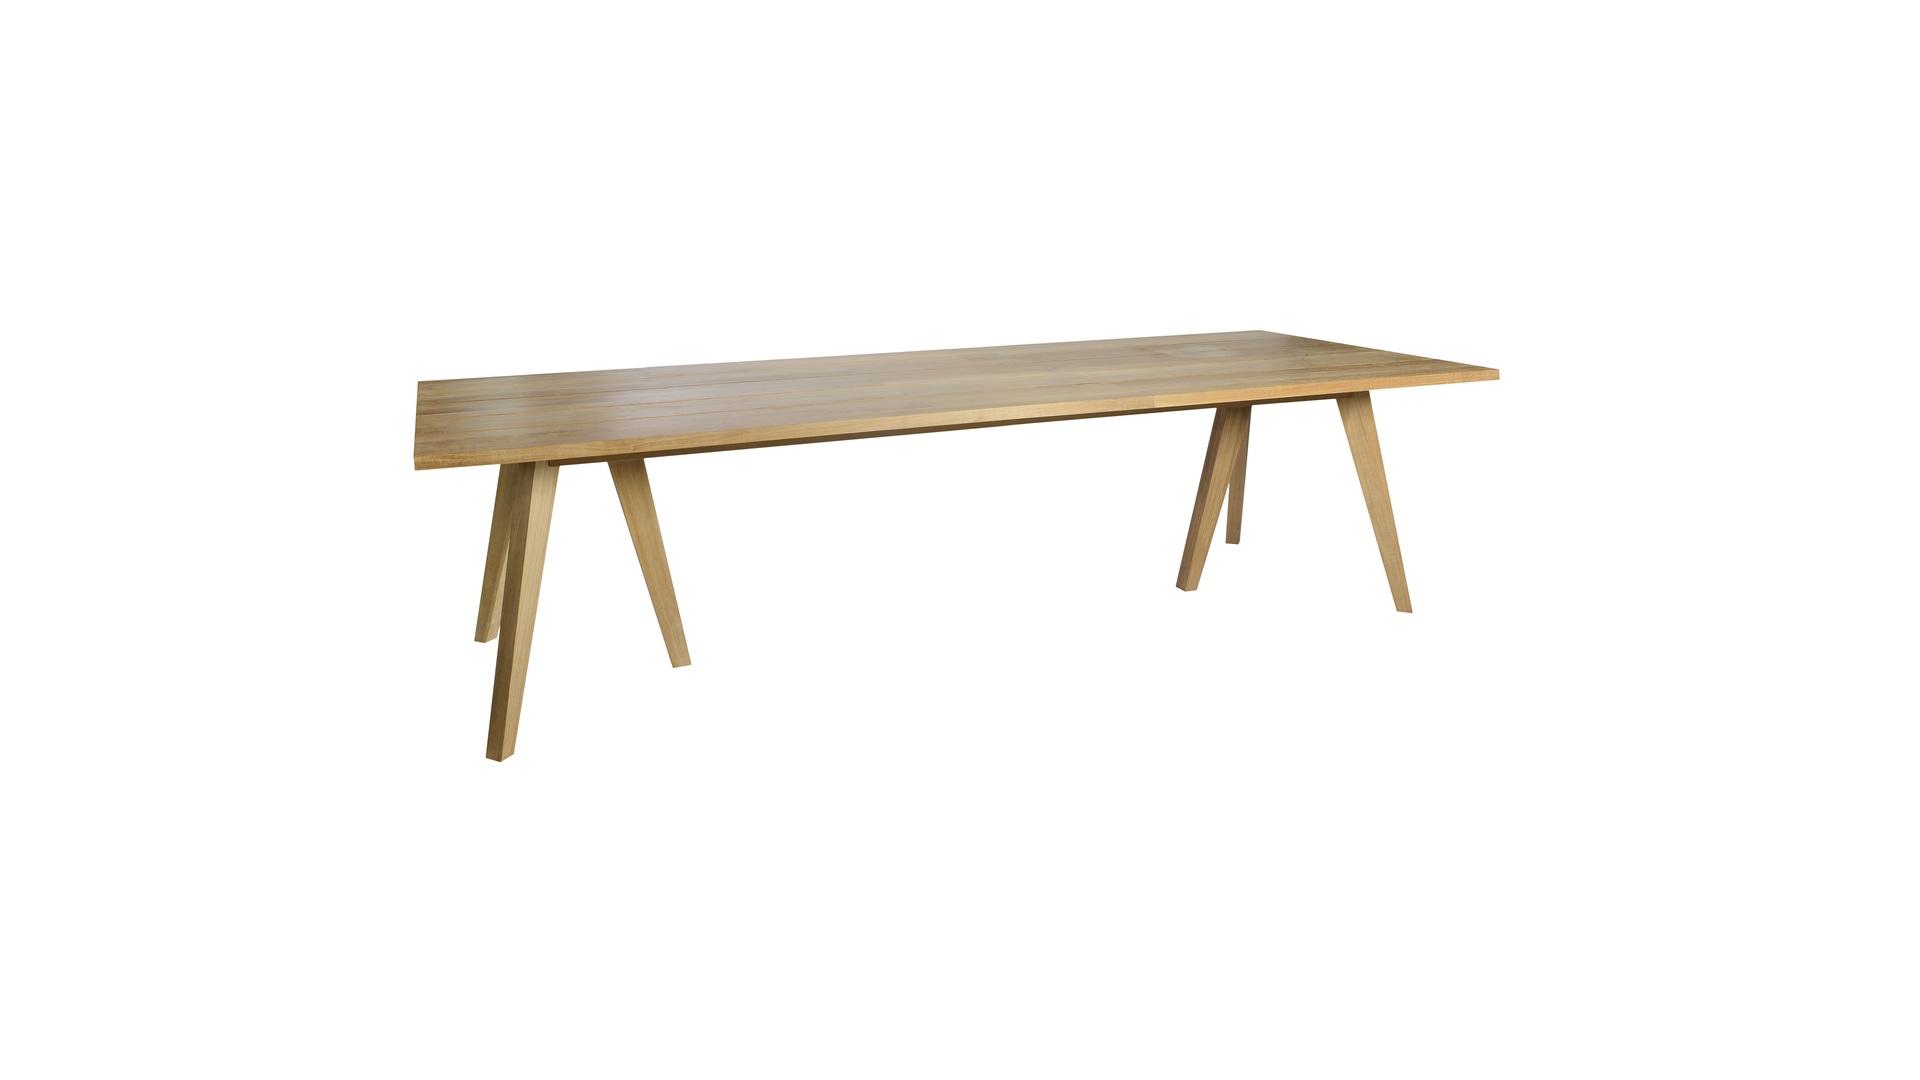 2020 Borek teak Chepri table 260x100 5687 3.jpg